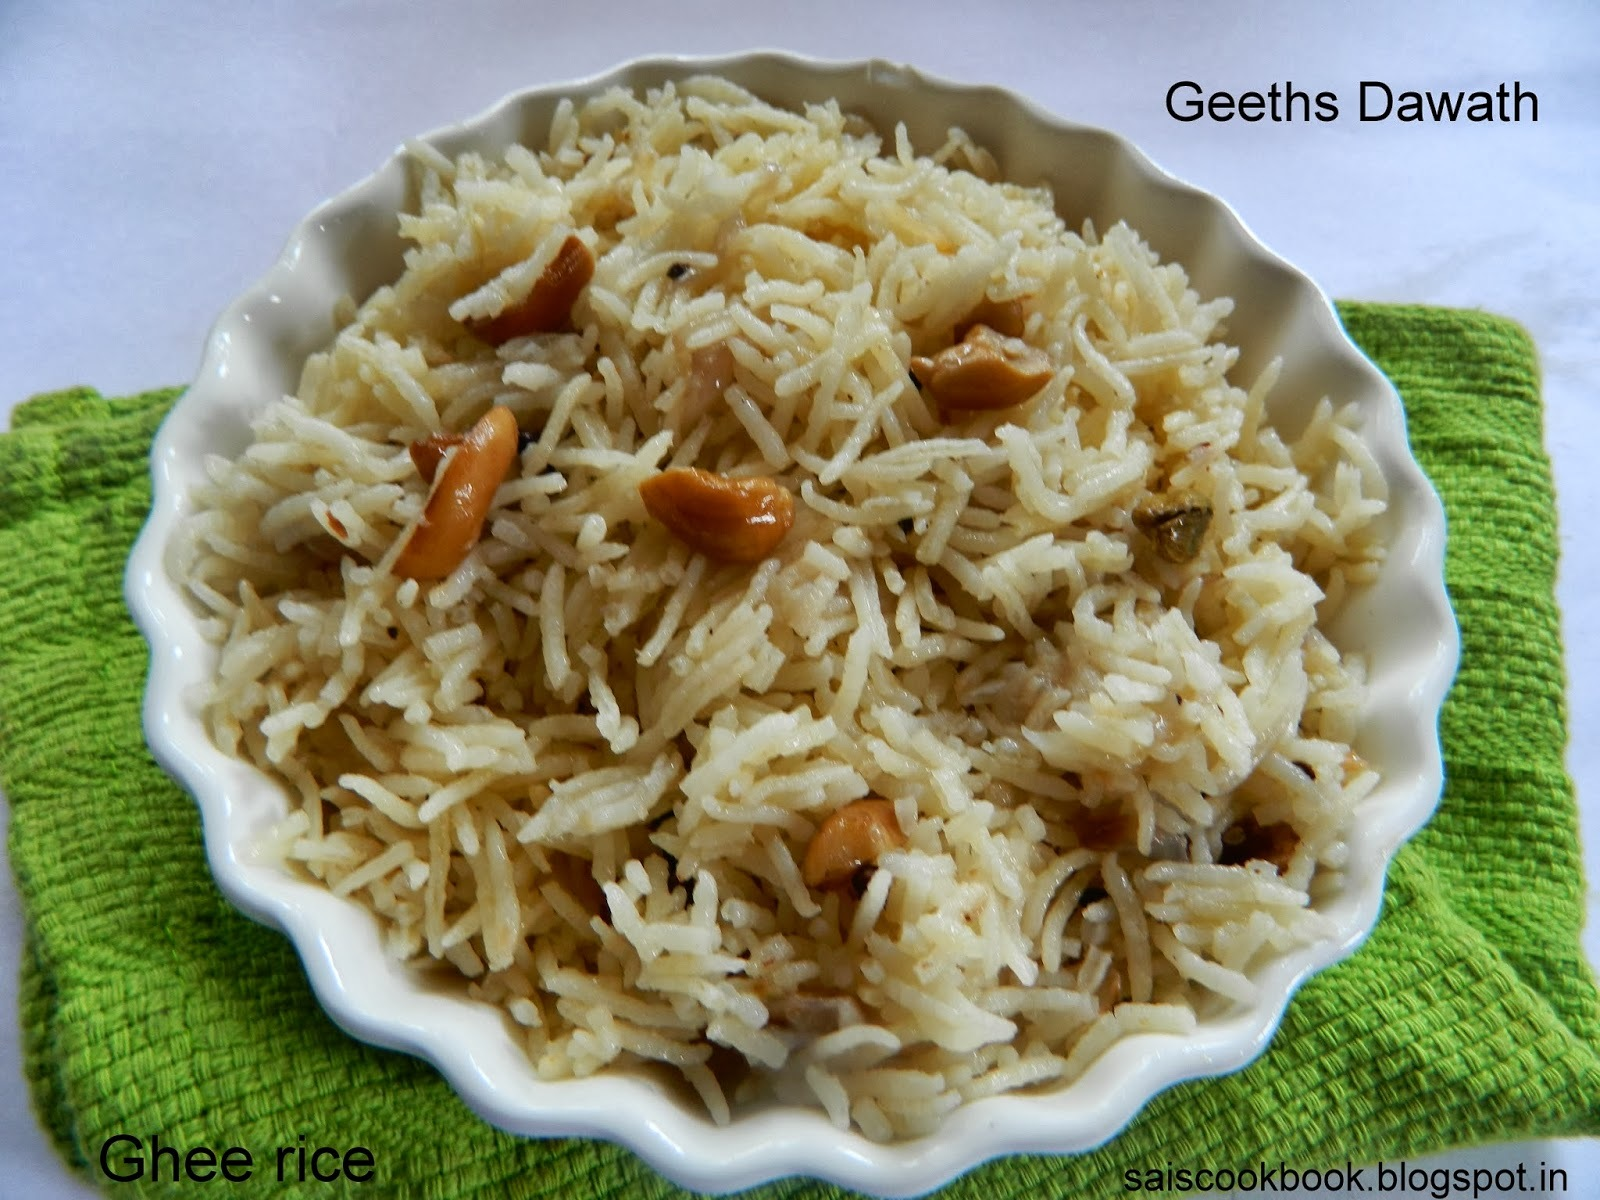 Ghee rice 2